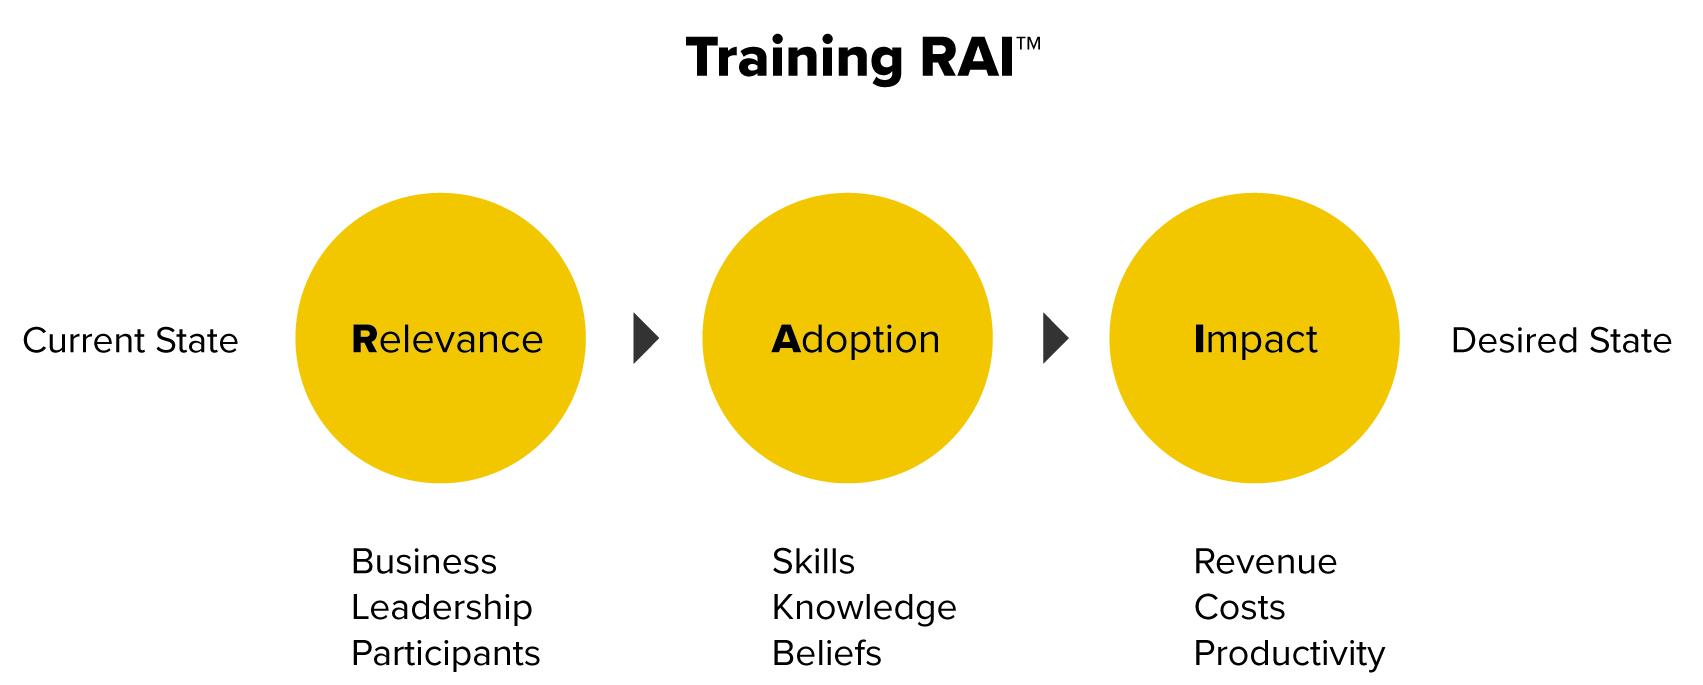 Training-RAI-1